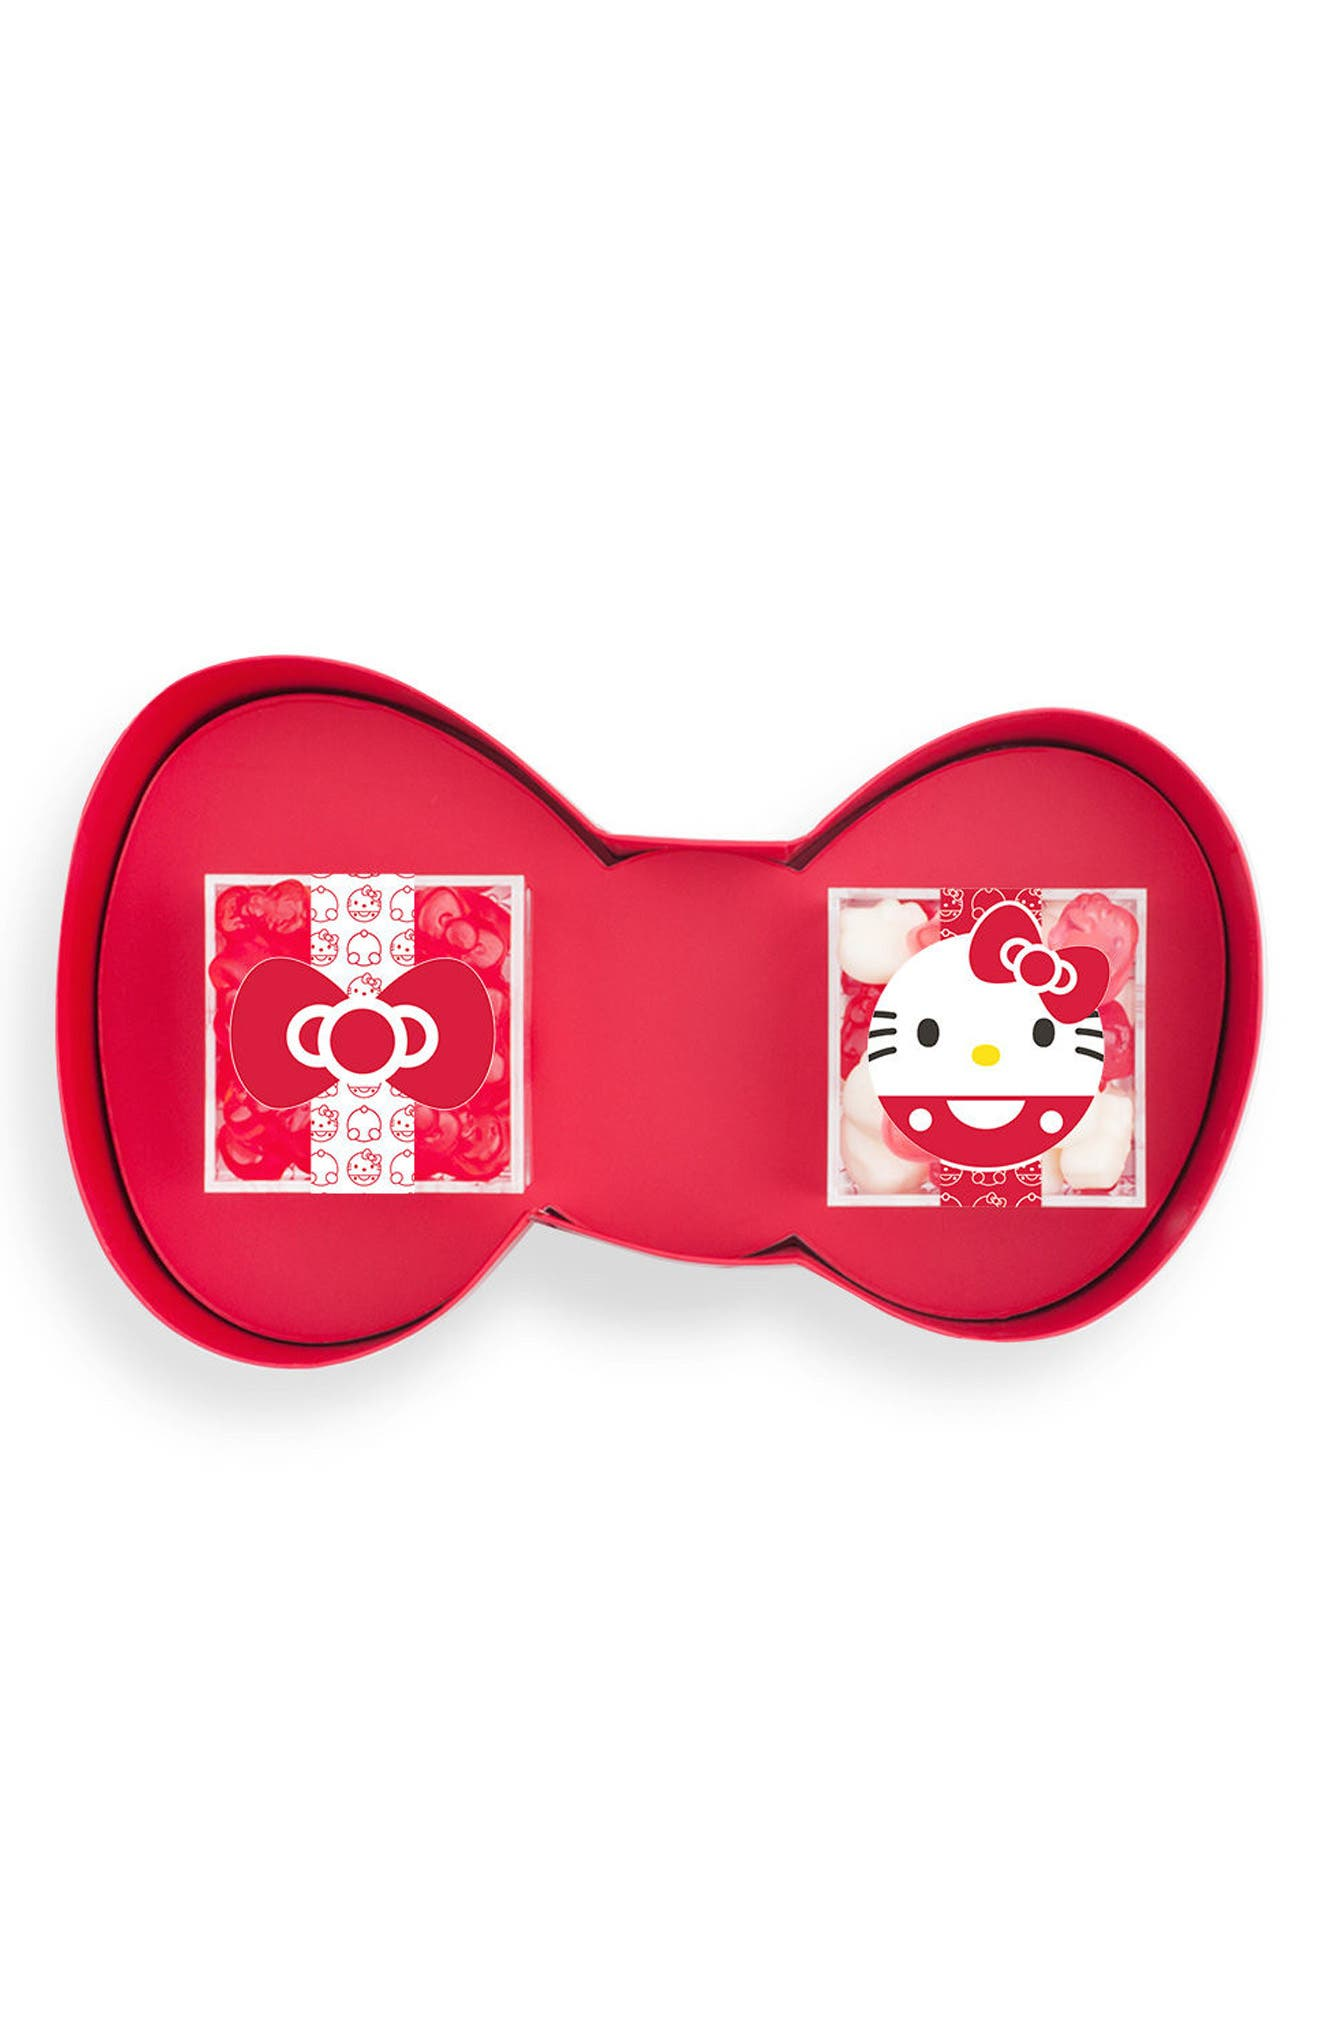 Alternate Image 1 Selected - sugarfina Hello Kitty® 2-Piece Gummy Candy Bento Box